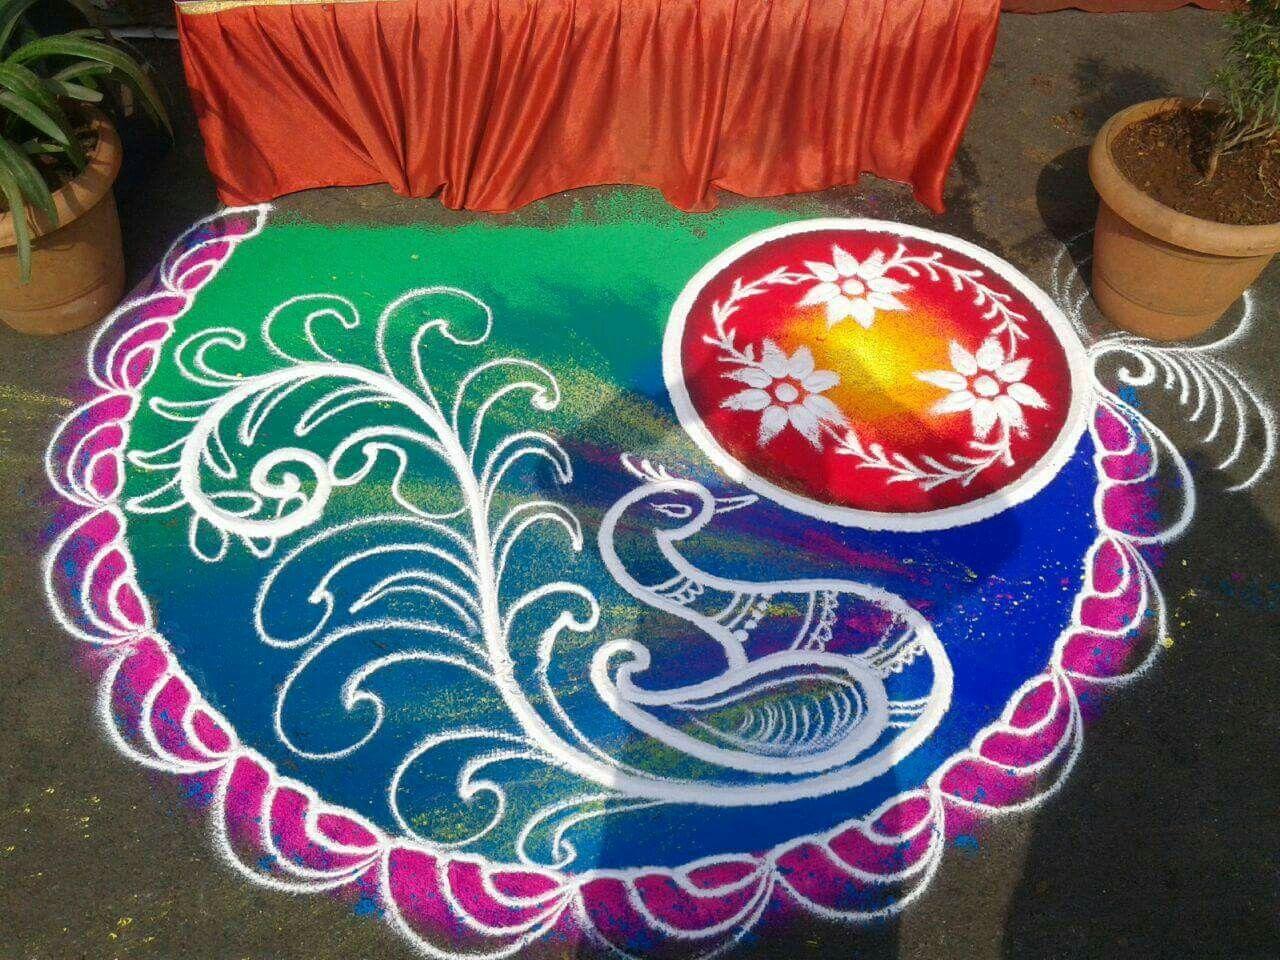 Amazing Rangoli Designs With Theme Go for Rangoli Designs With Theme Go Green  156eri